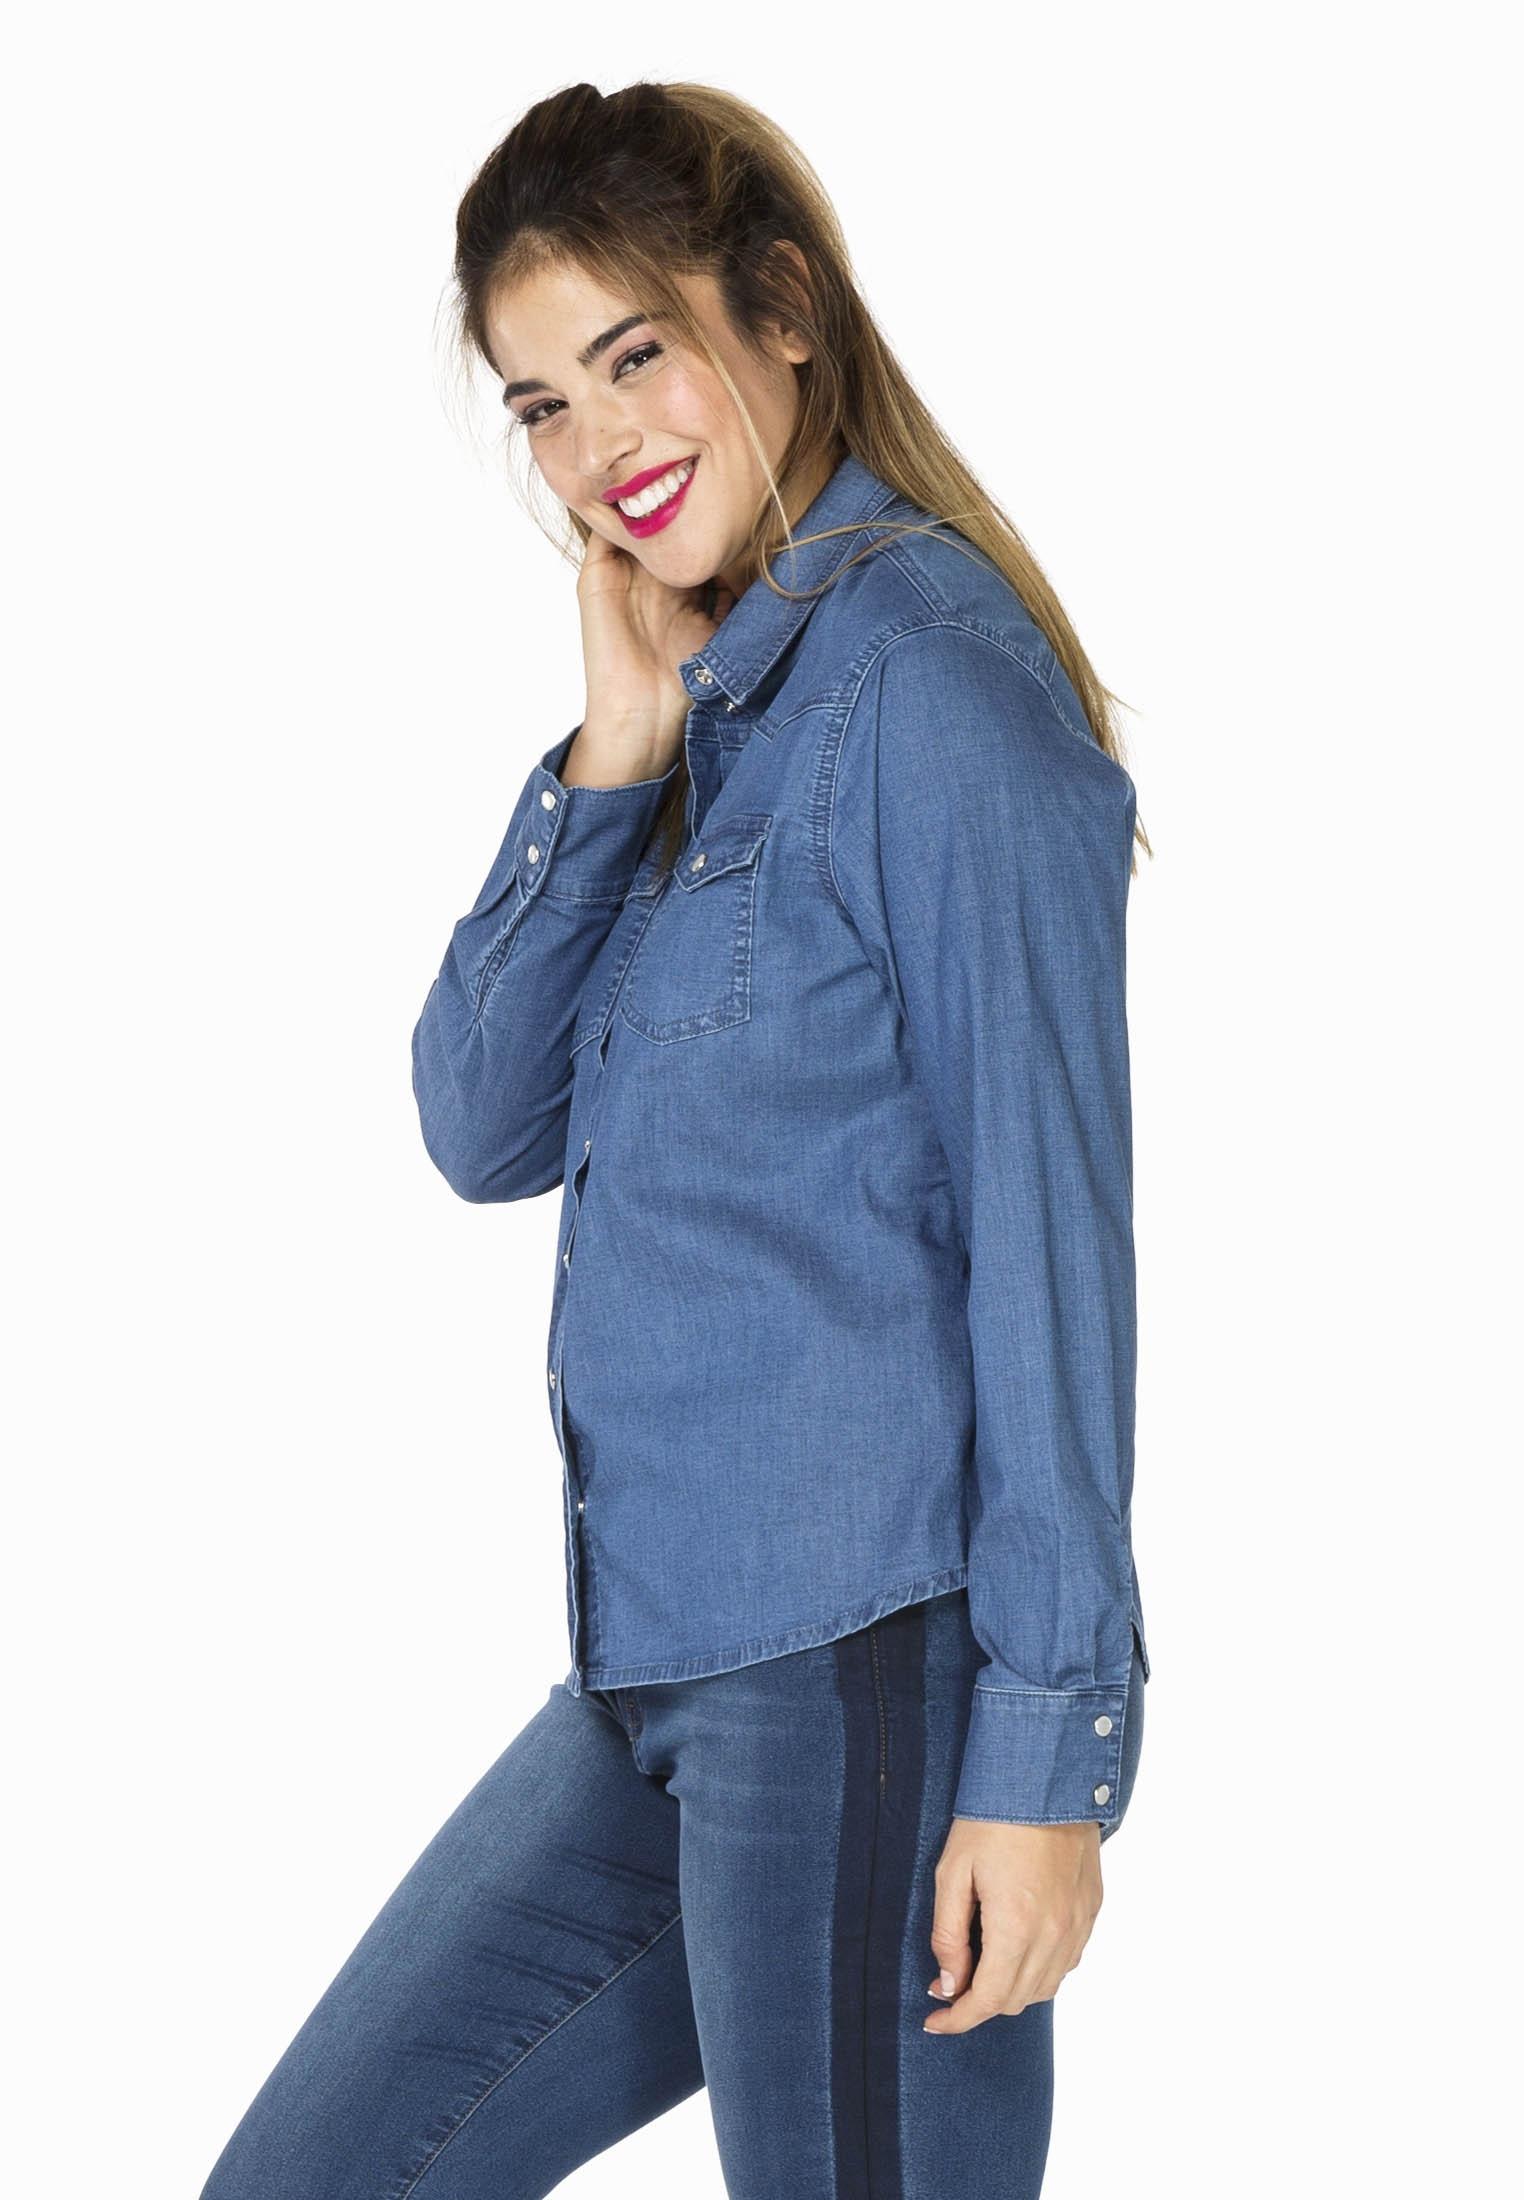 Blouse denim stretch shirt